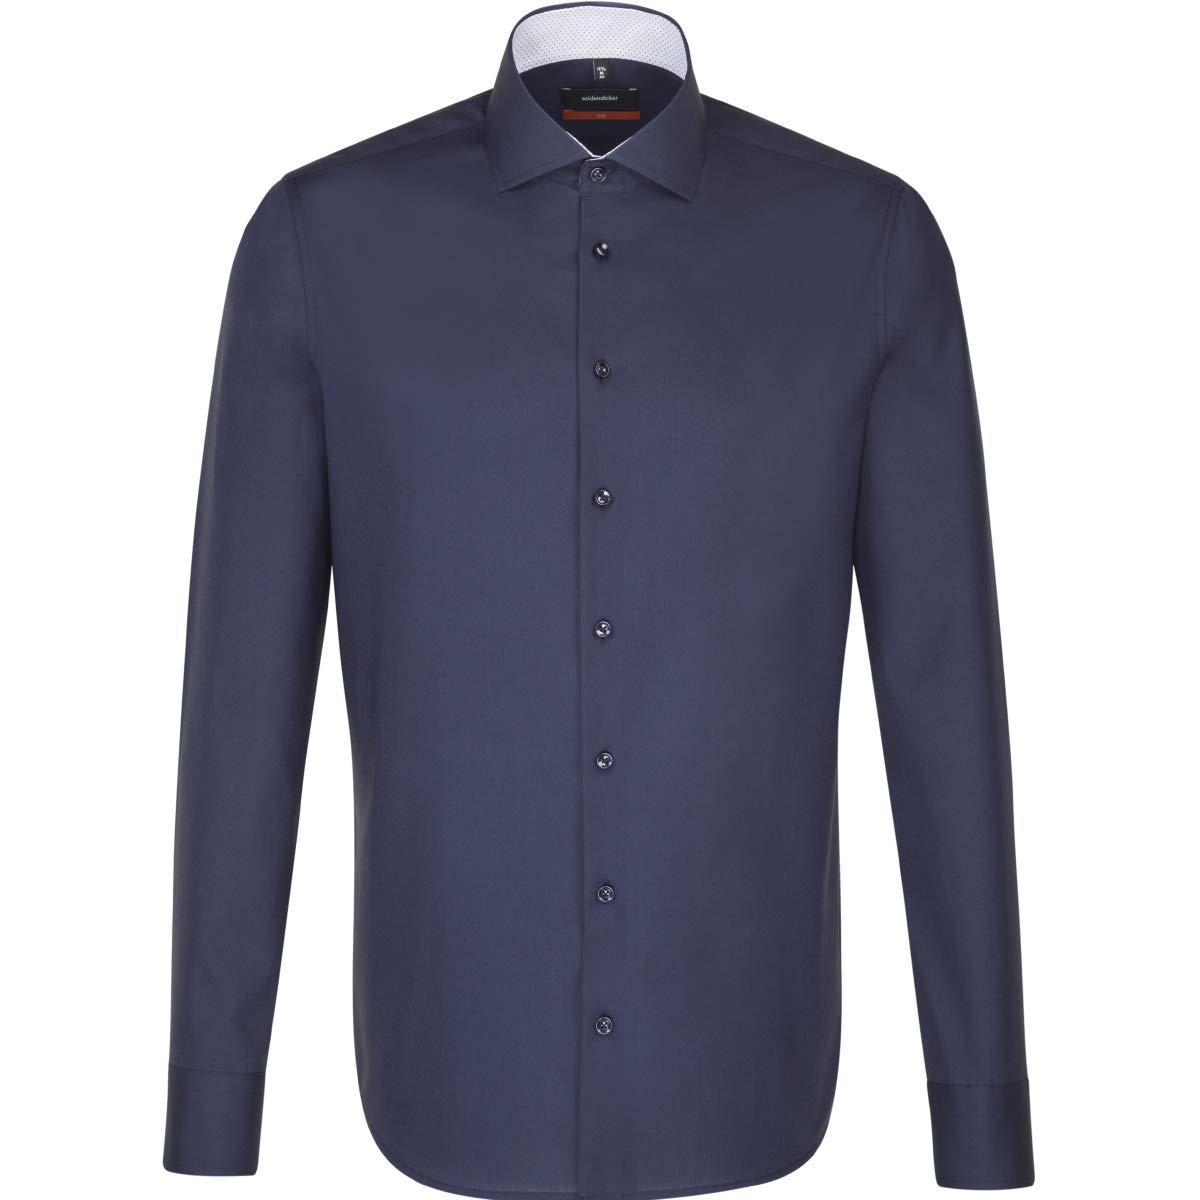 Seidensticker - Camisa Formal - Liso - Clásico - Manga Larga - para Hombre